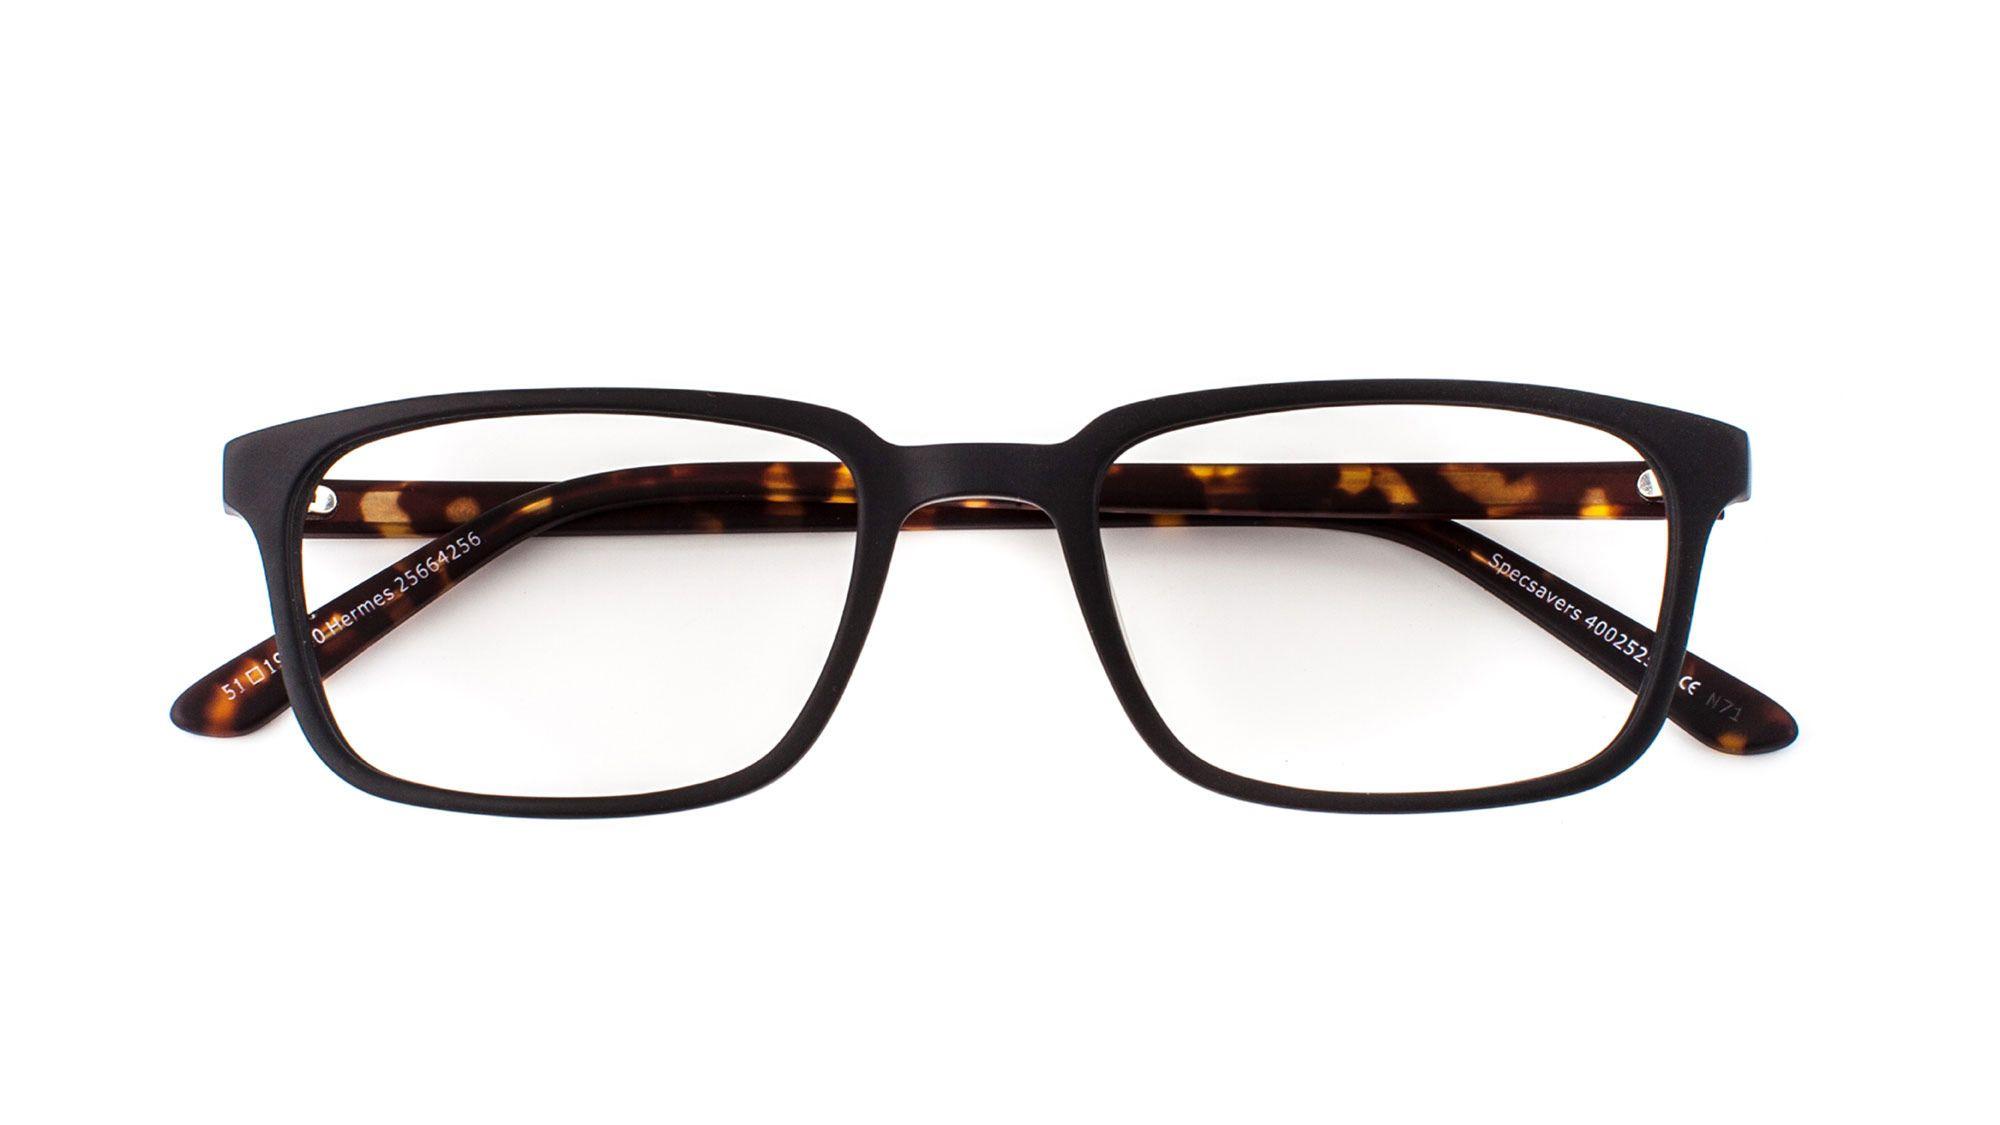 Specsavers glasses - HERMES